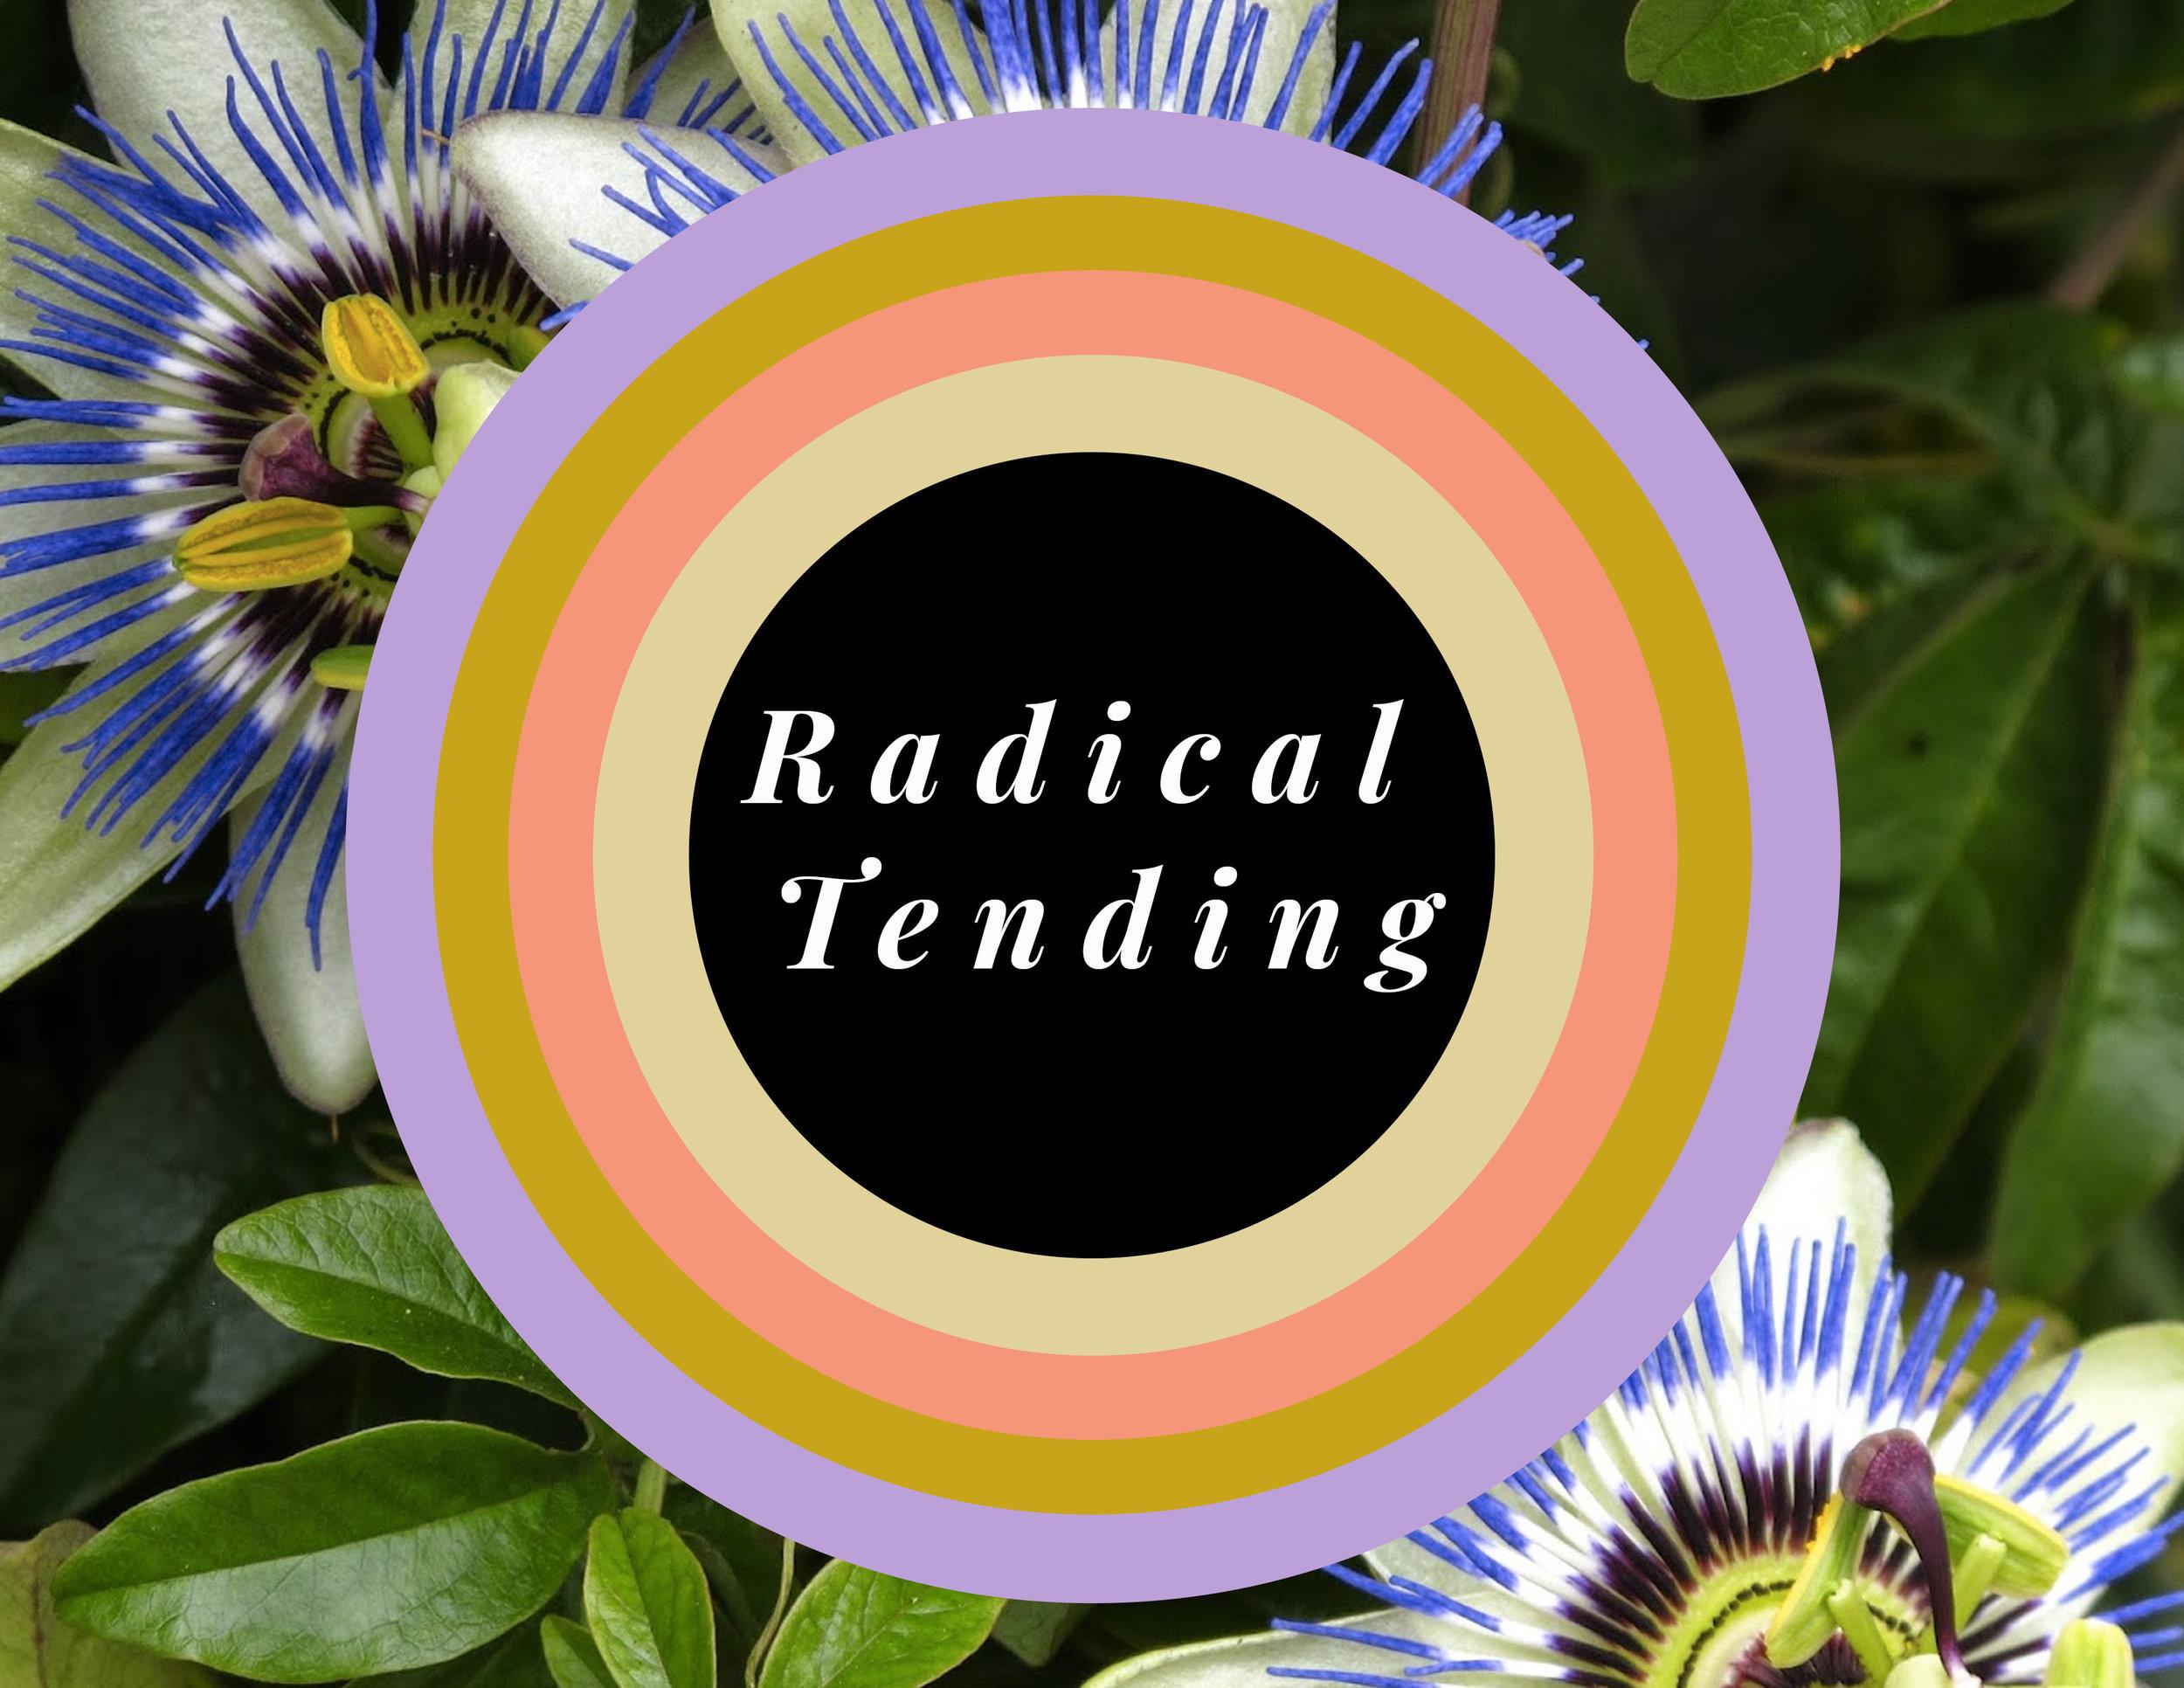 RadicalTending_Collage.jpg